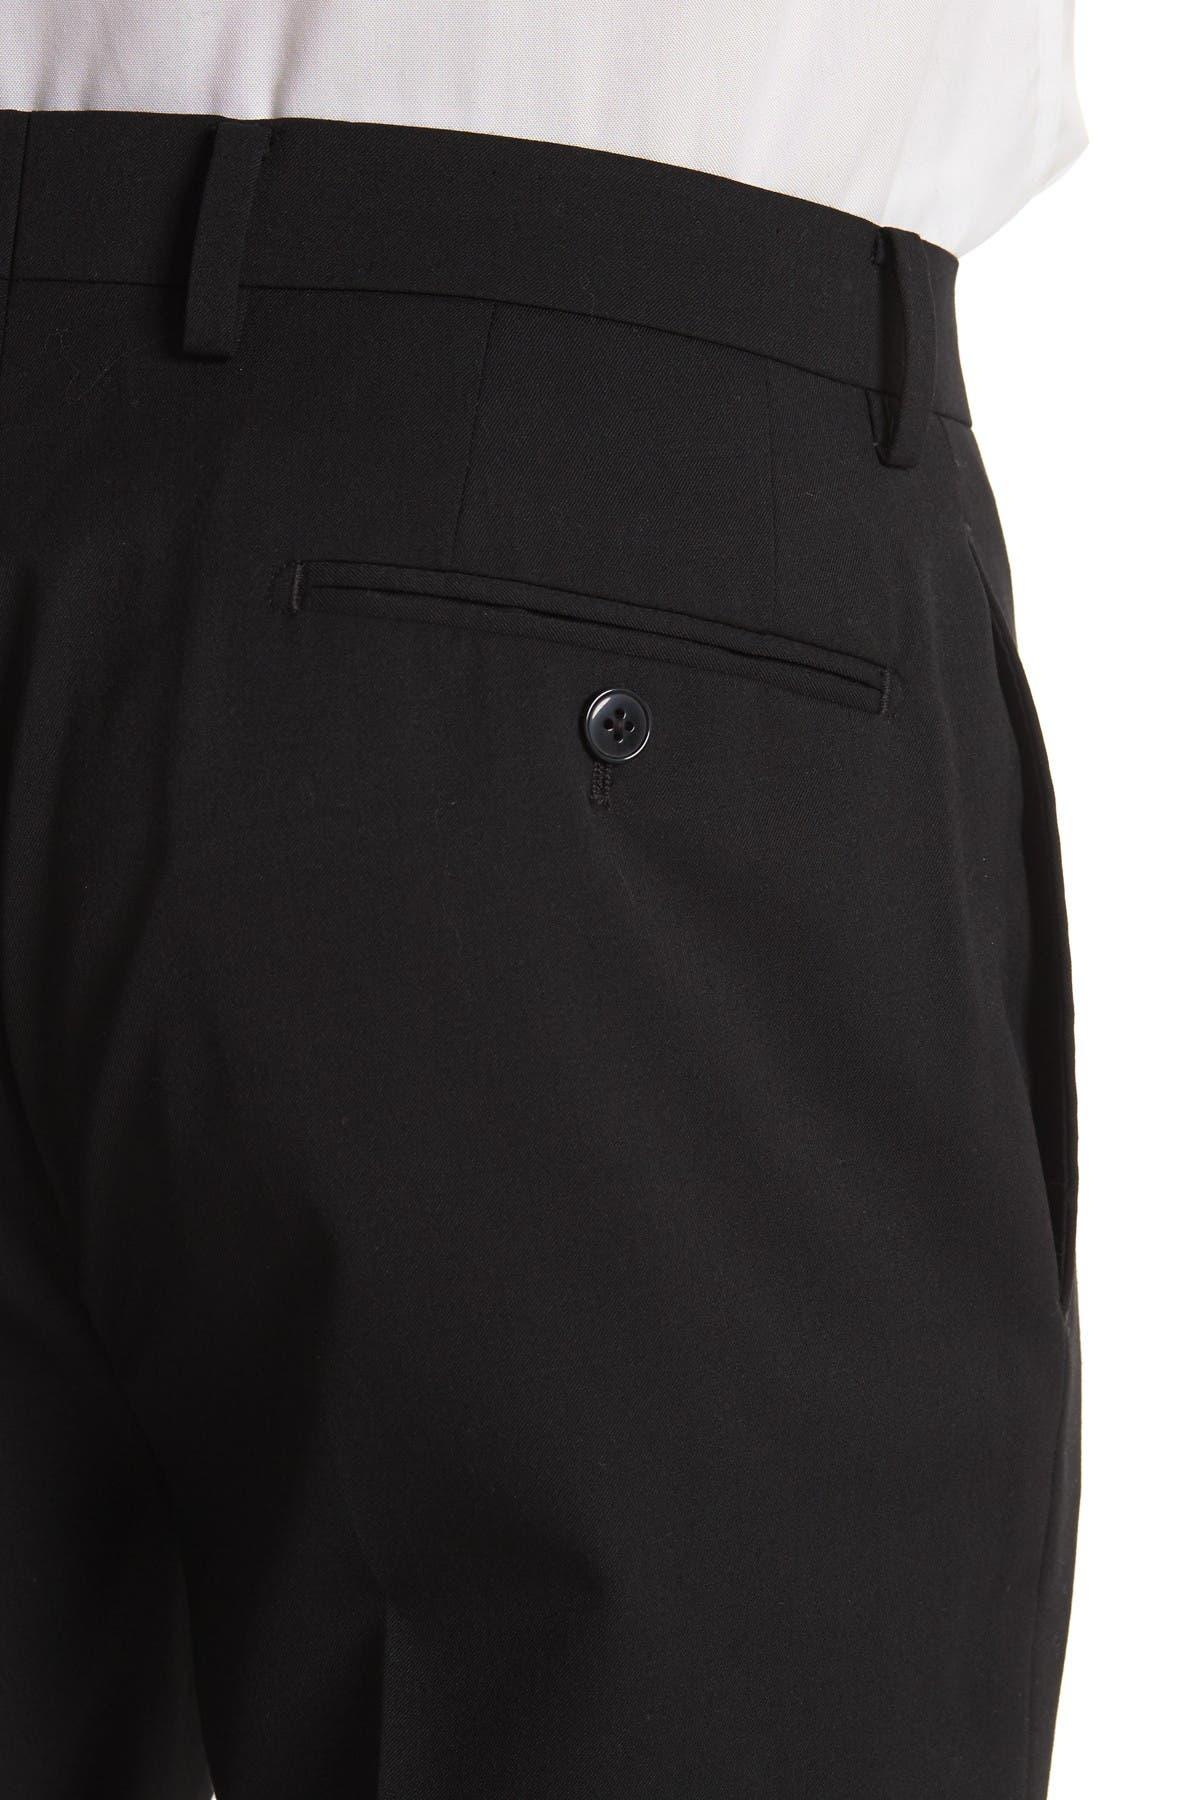 Image of Calvin Klein Black Two Button Notch Lapel Wool Blend Suit